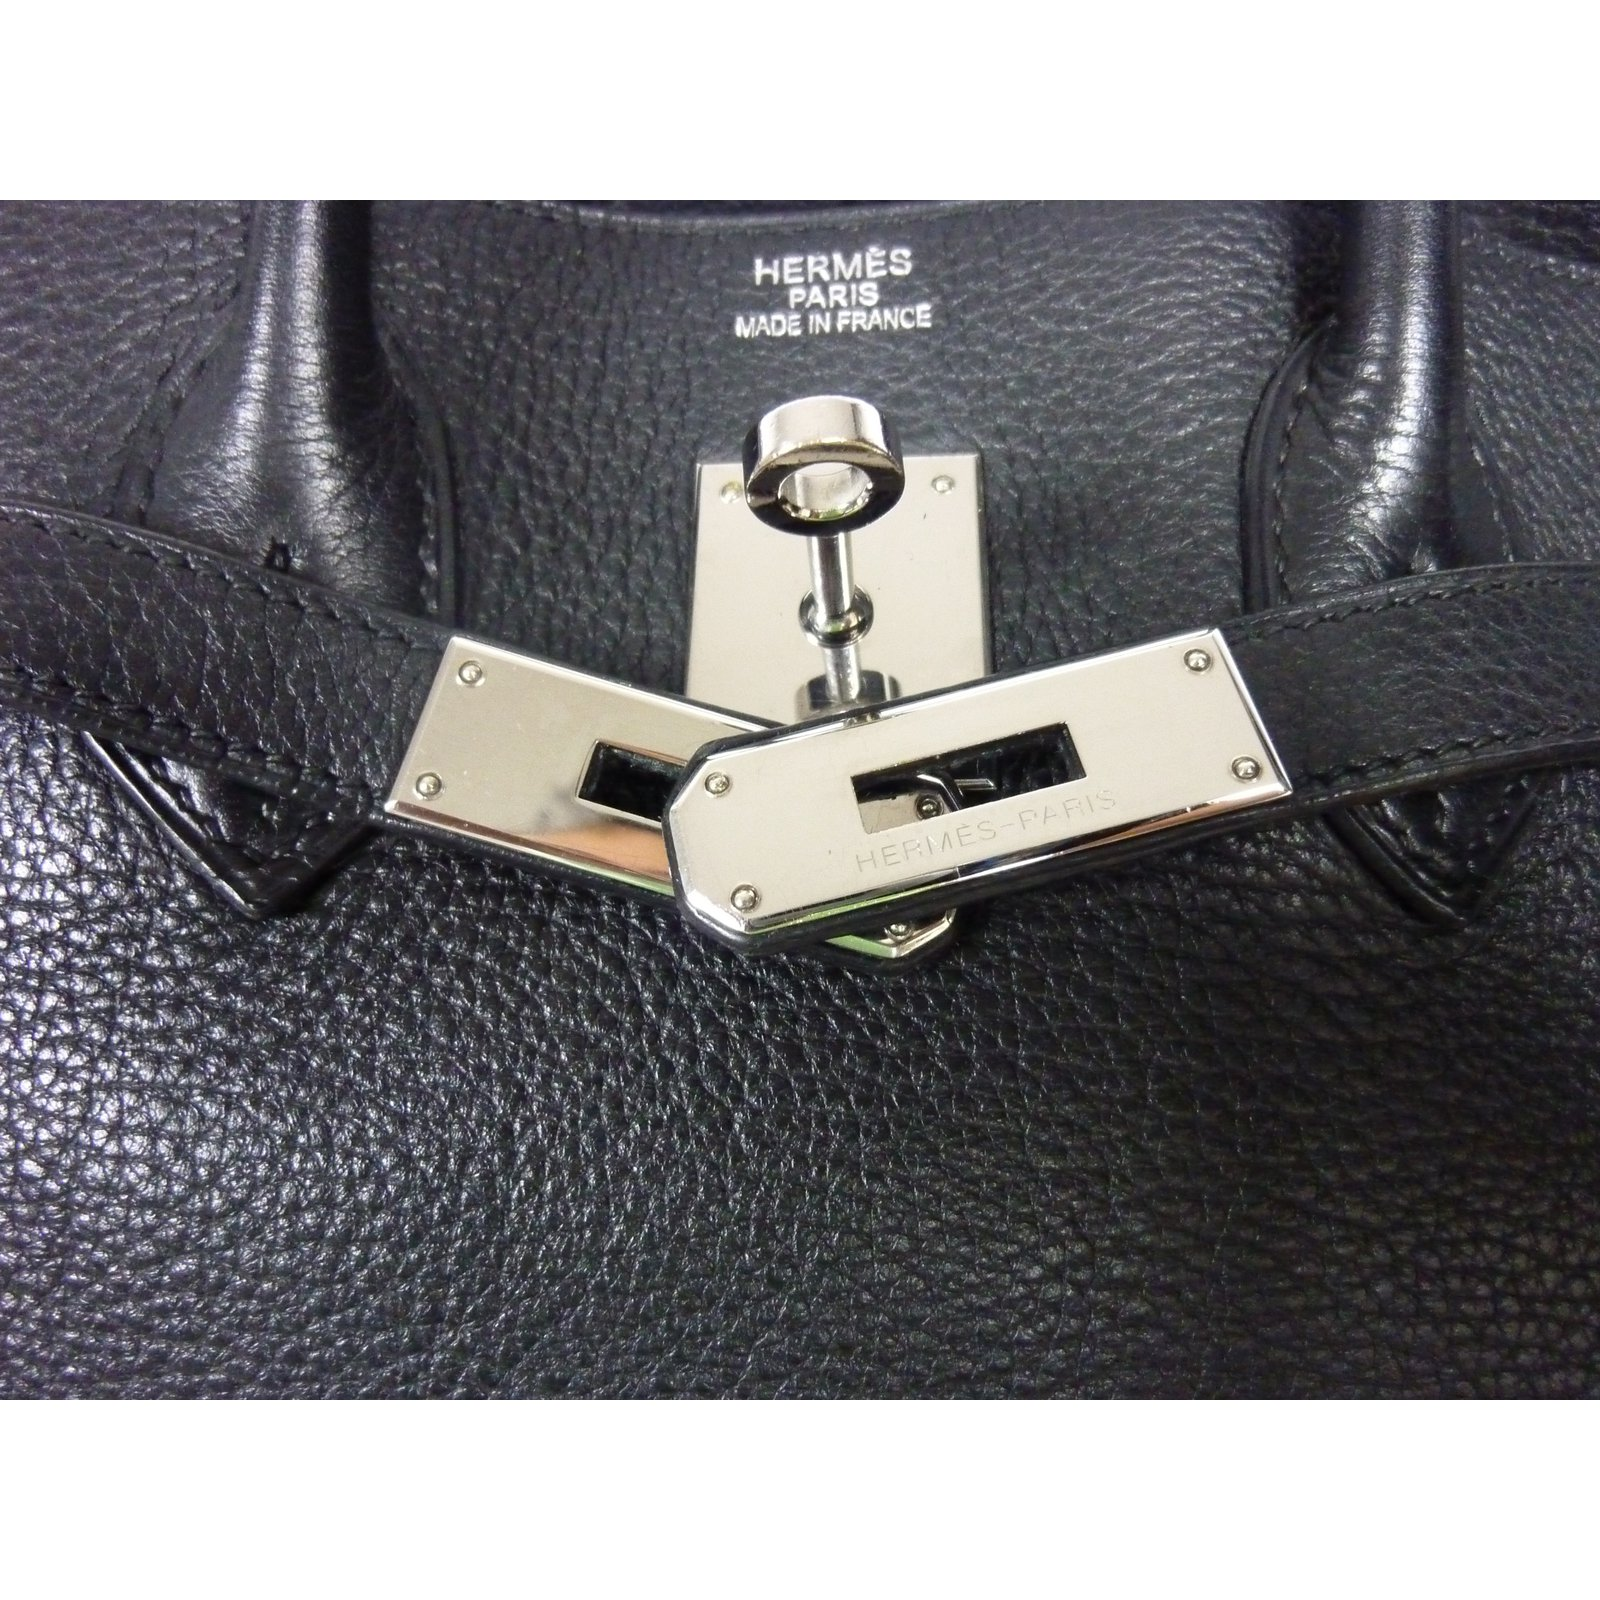 Sacs à main Hermès Sac à main Hermès Birkin 35 en cuir Togo noir en  excellent état! Cuir Noir ref.33970 - Joli Closet 3d6c1a8a8fc